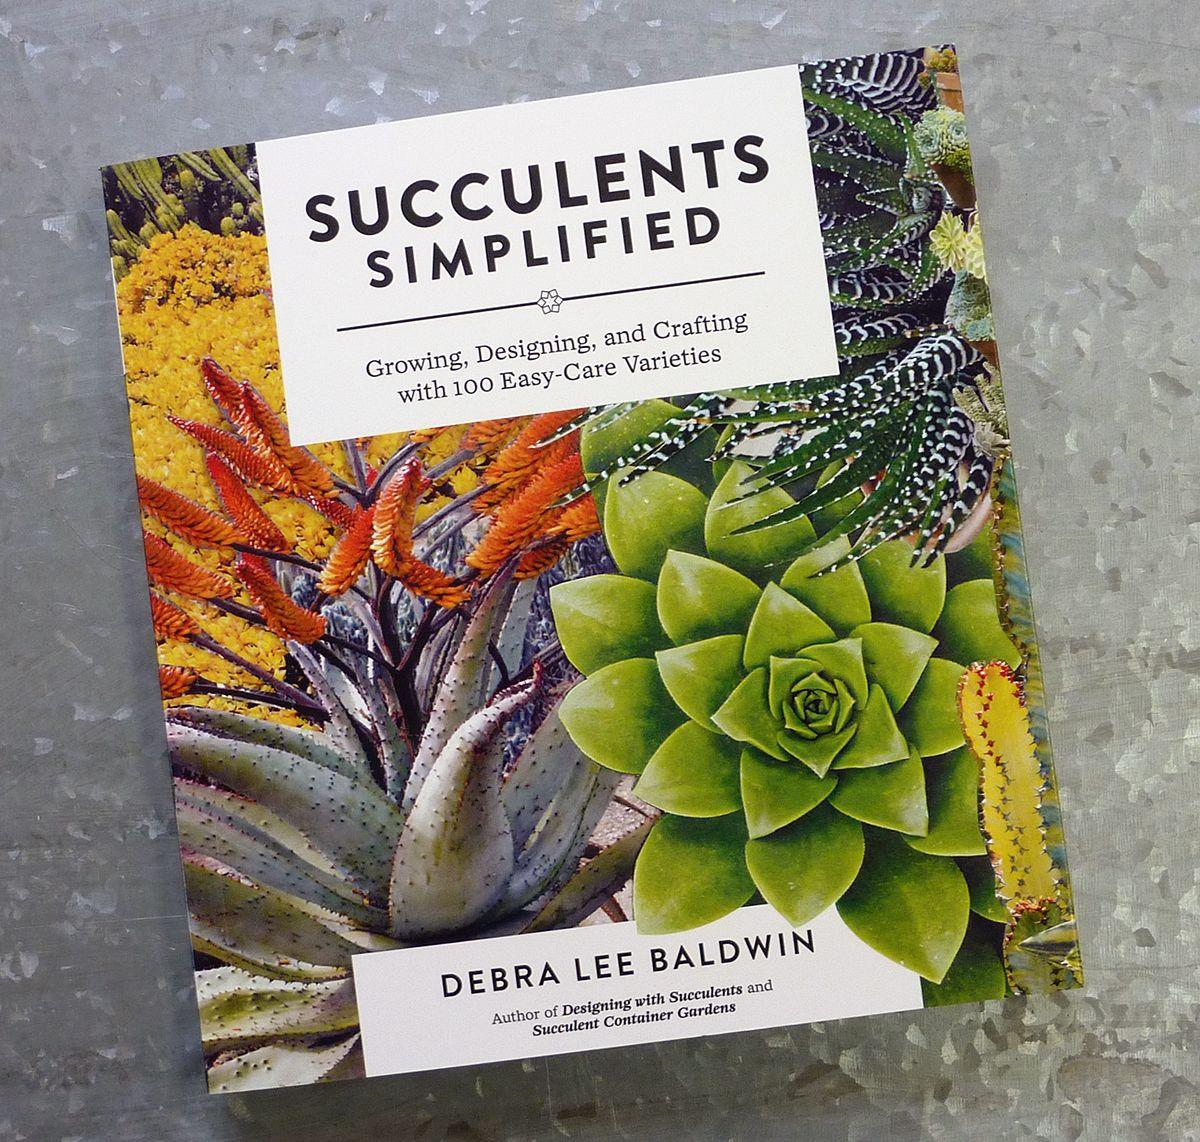 Succulents Simplified (Debra Lee Baldwin)